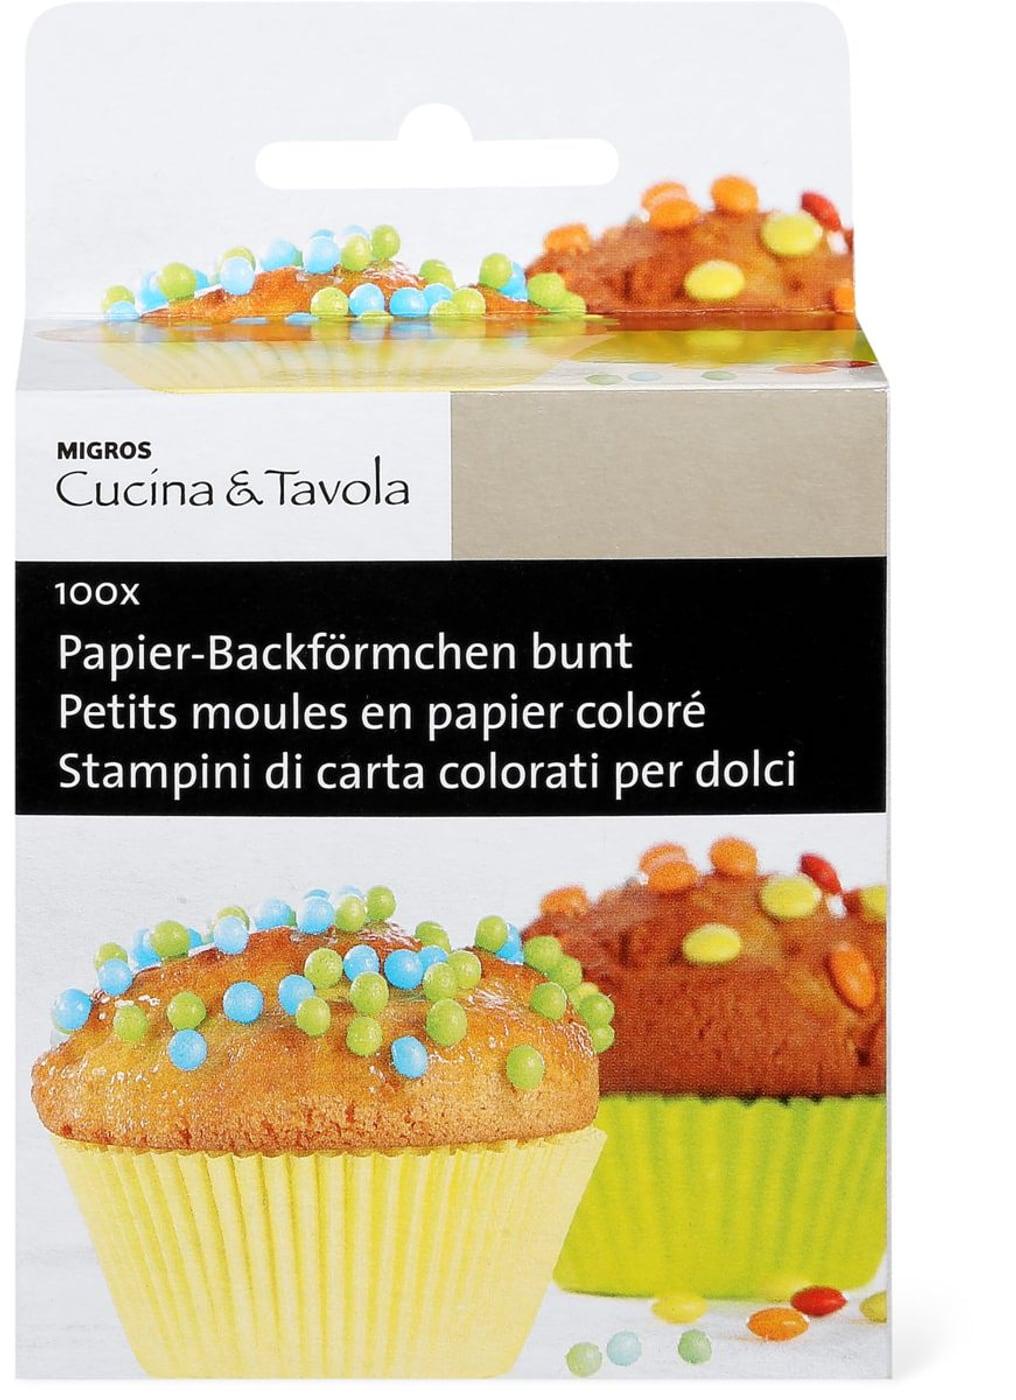 Cucina tavola papier backf rmchen cucina tavola migros for Tavola cucina